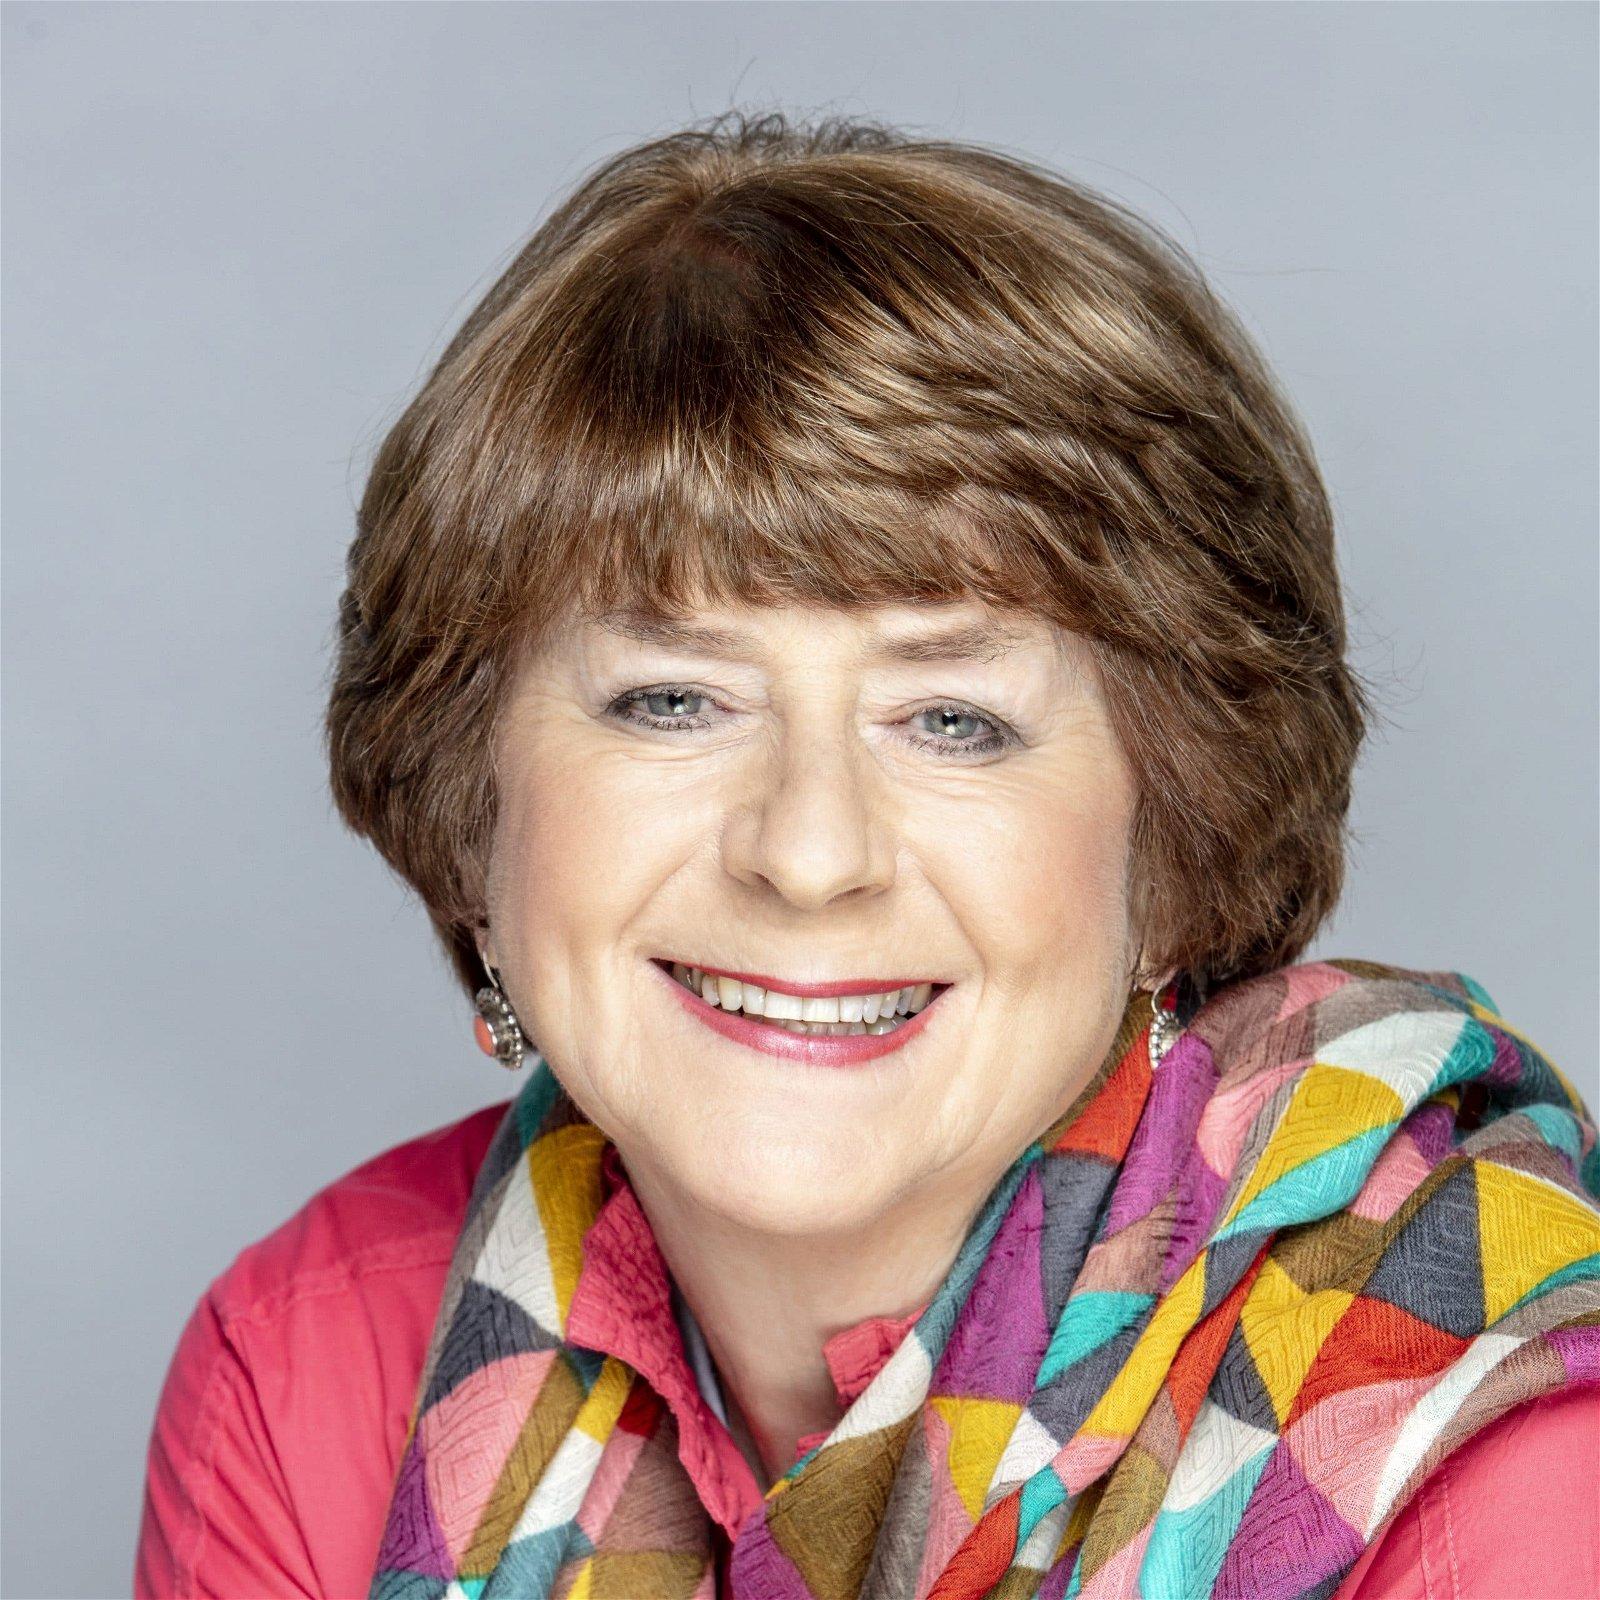 Pam-Ayres-English-Poet-speaker-entertainer-book-at-Great-British-Speakers